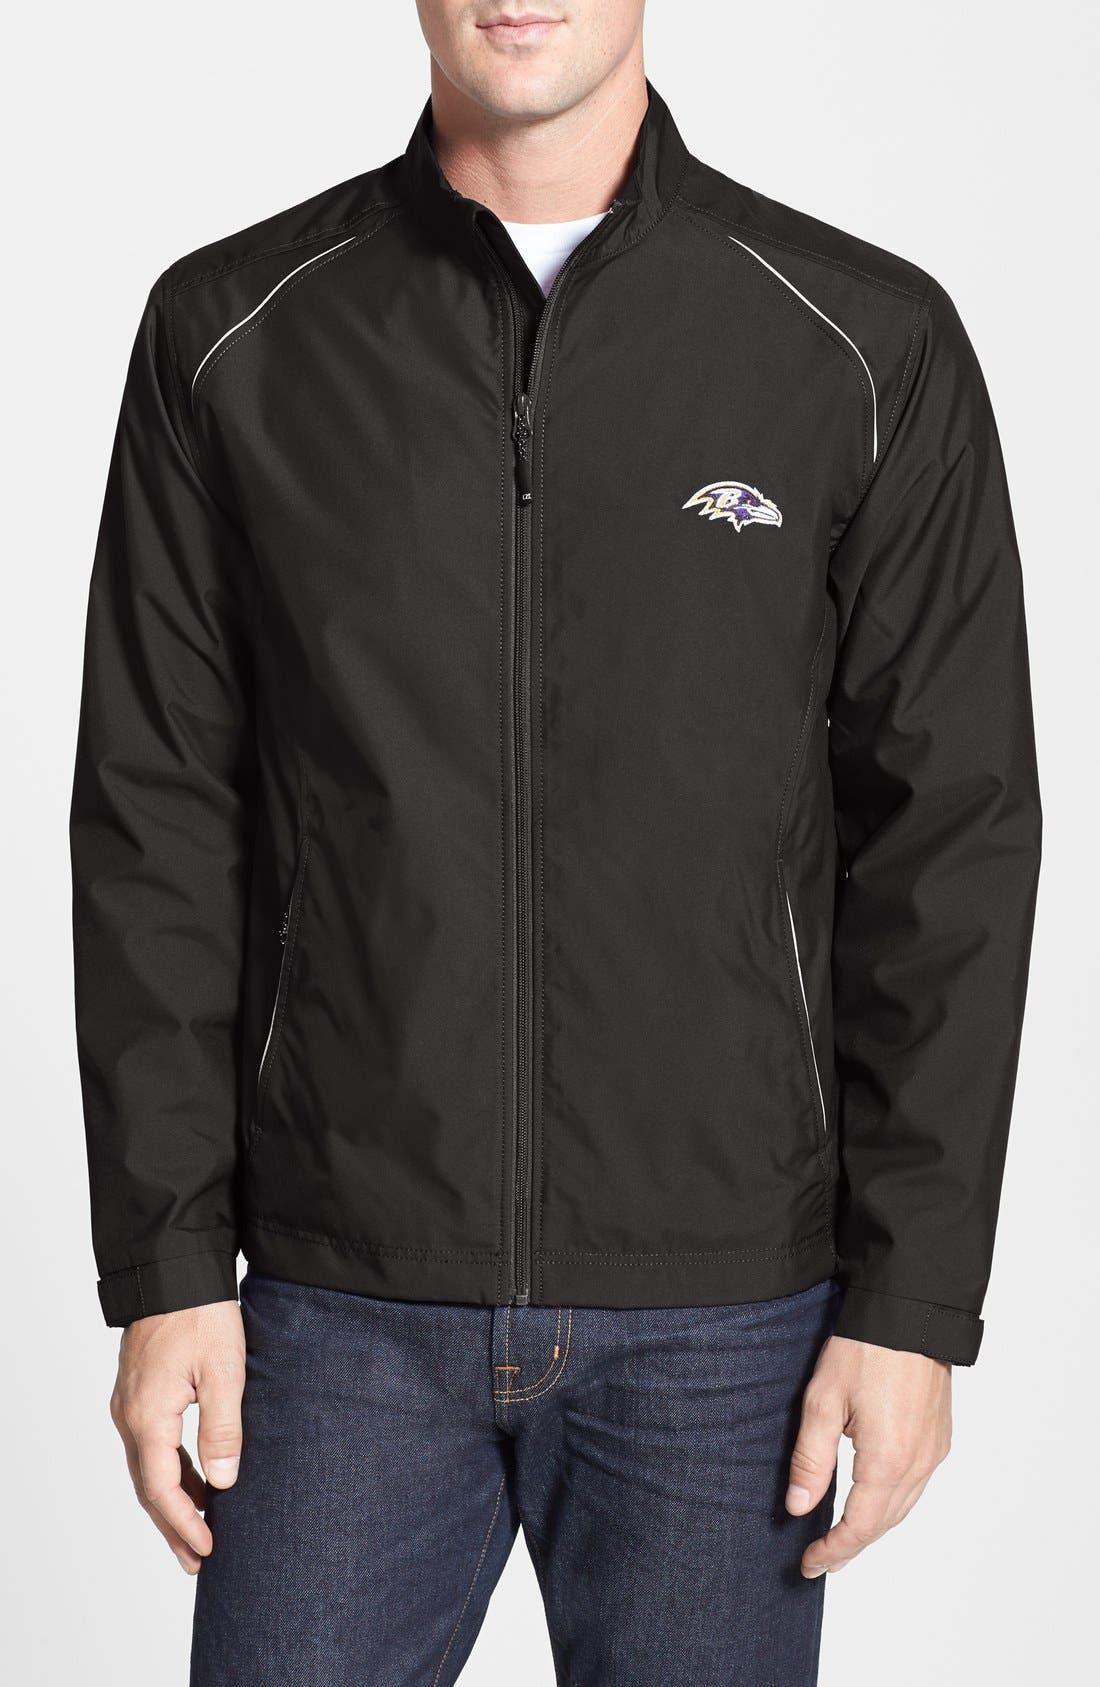 Baltimore Ravens - Beacon WeatherTec Wind & Water Resistant Jacket,                             Main thumbnail 1, color,                             Black